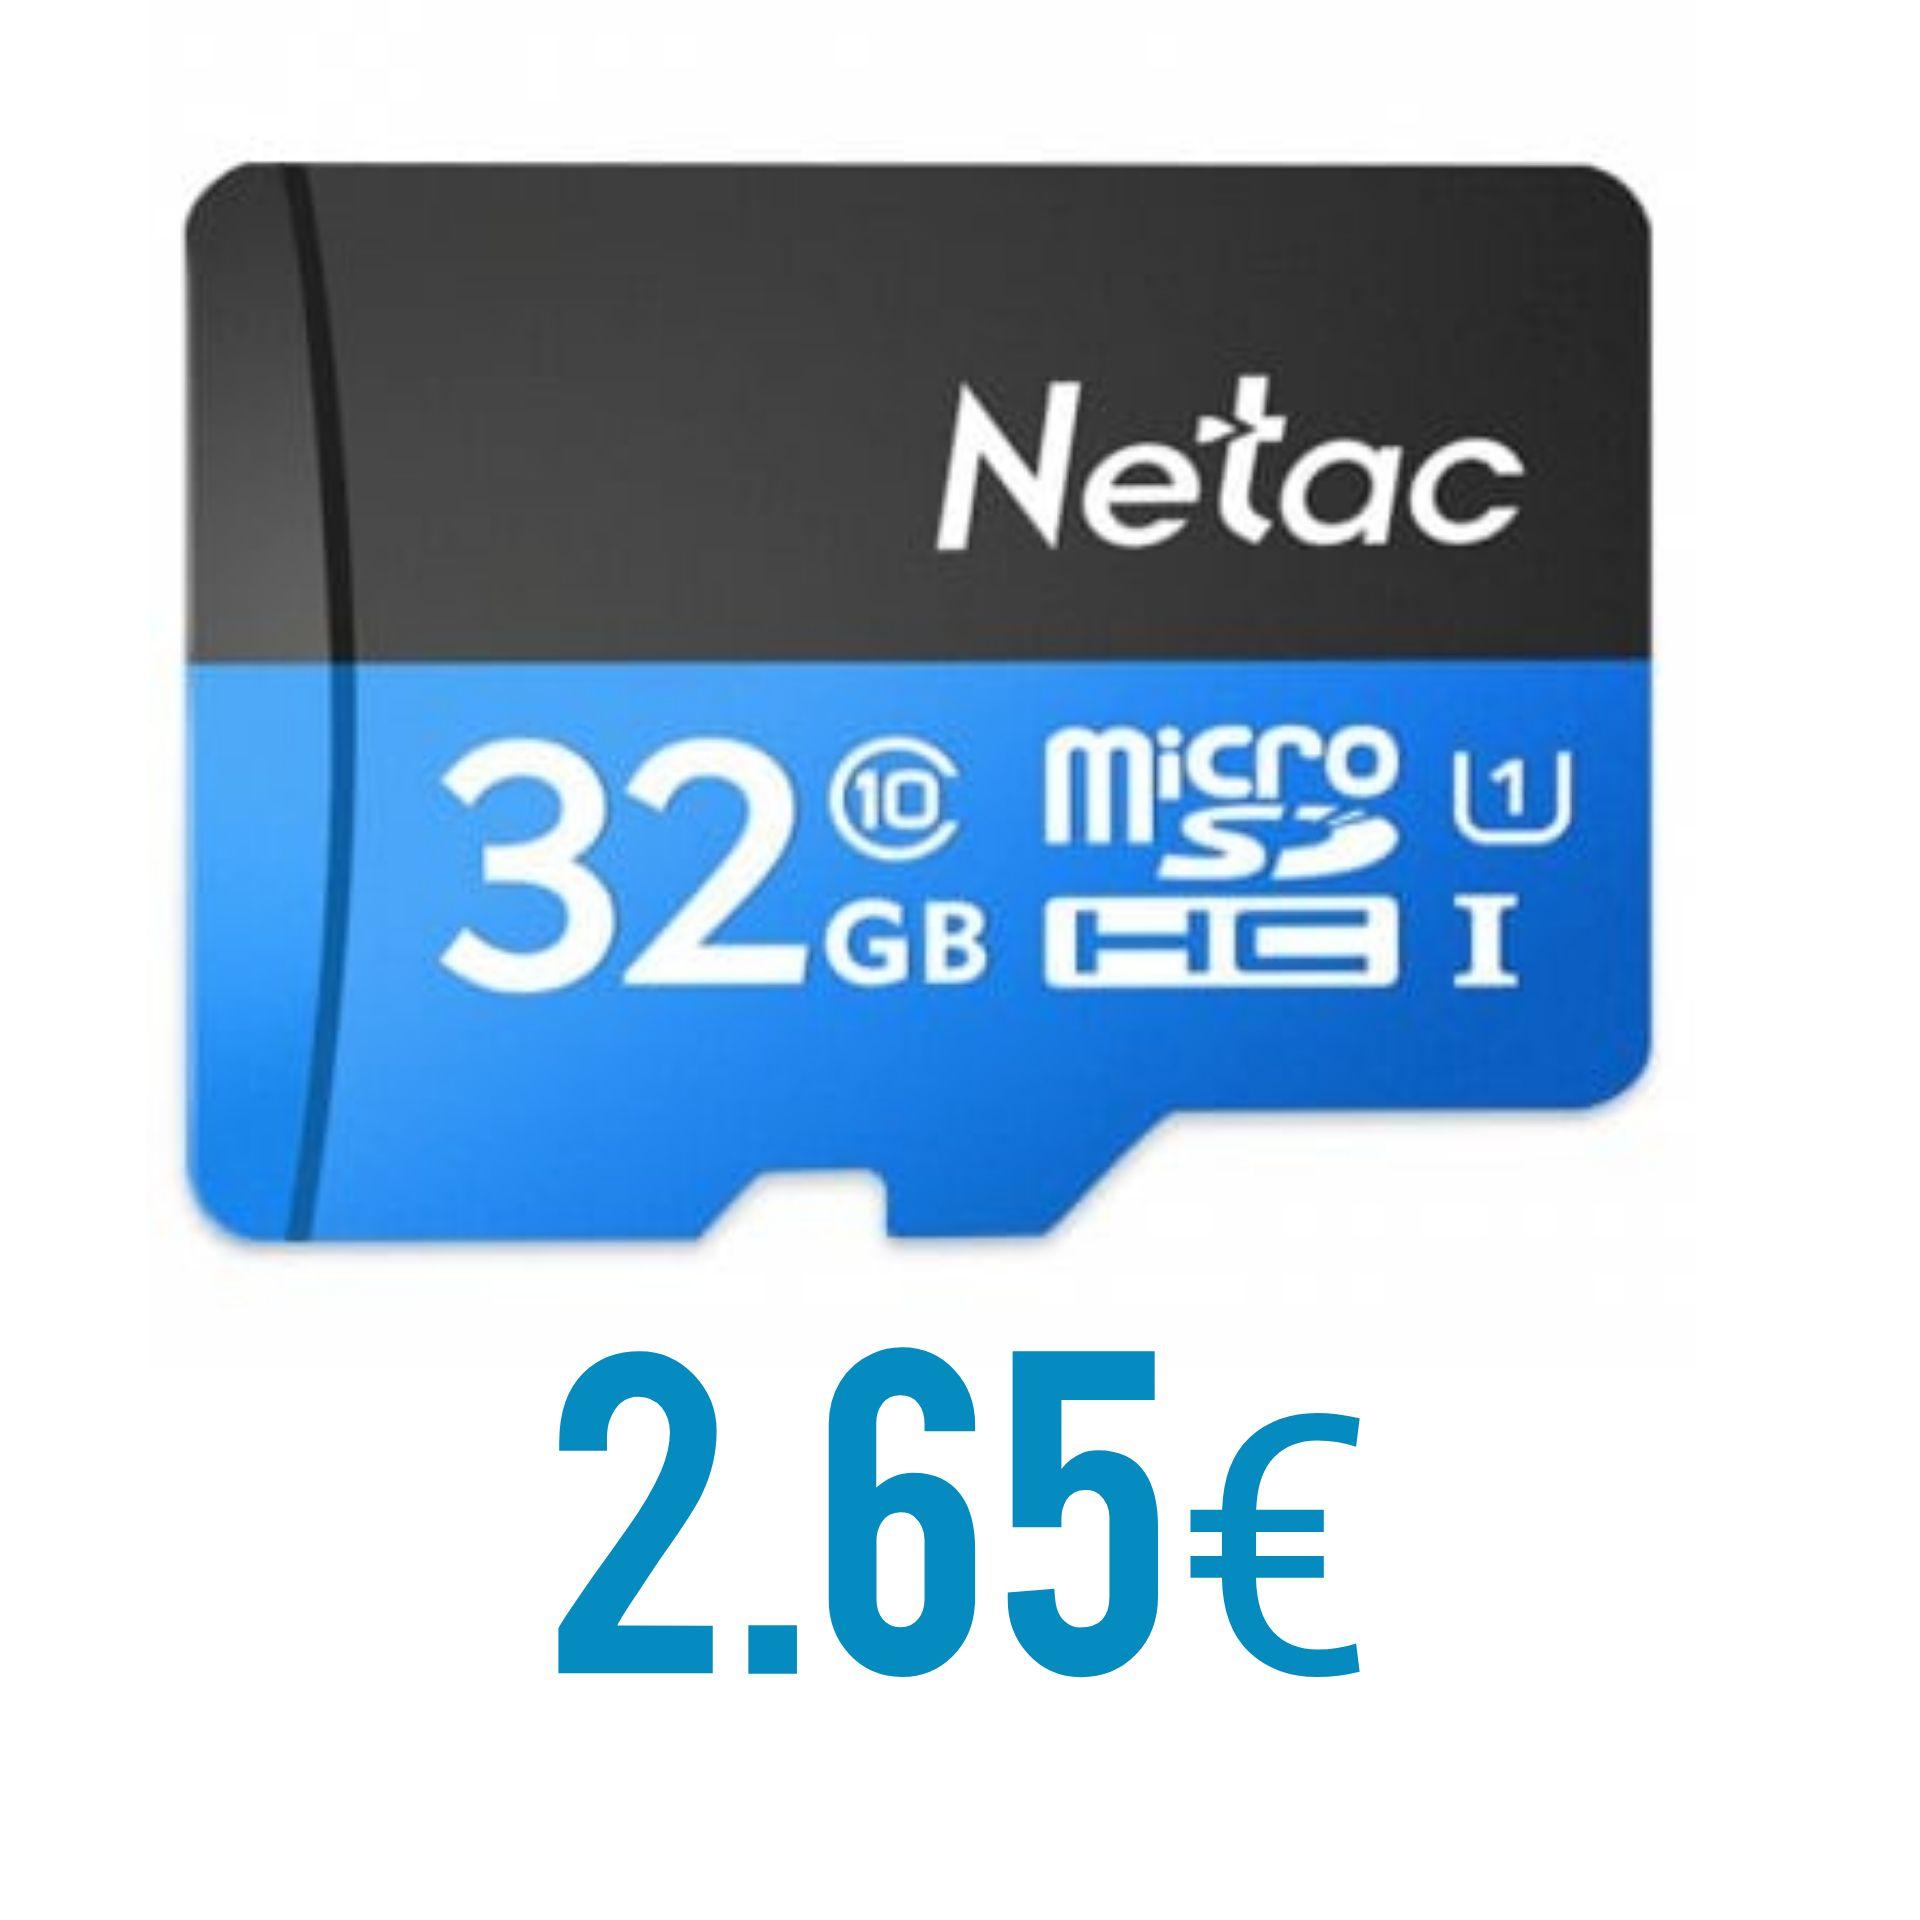 MicroSD Netac 32Gb - Clase 10 [Preciazo]